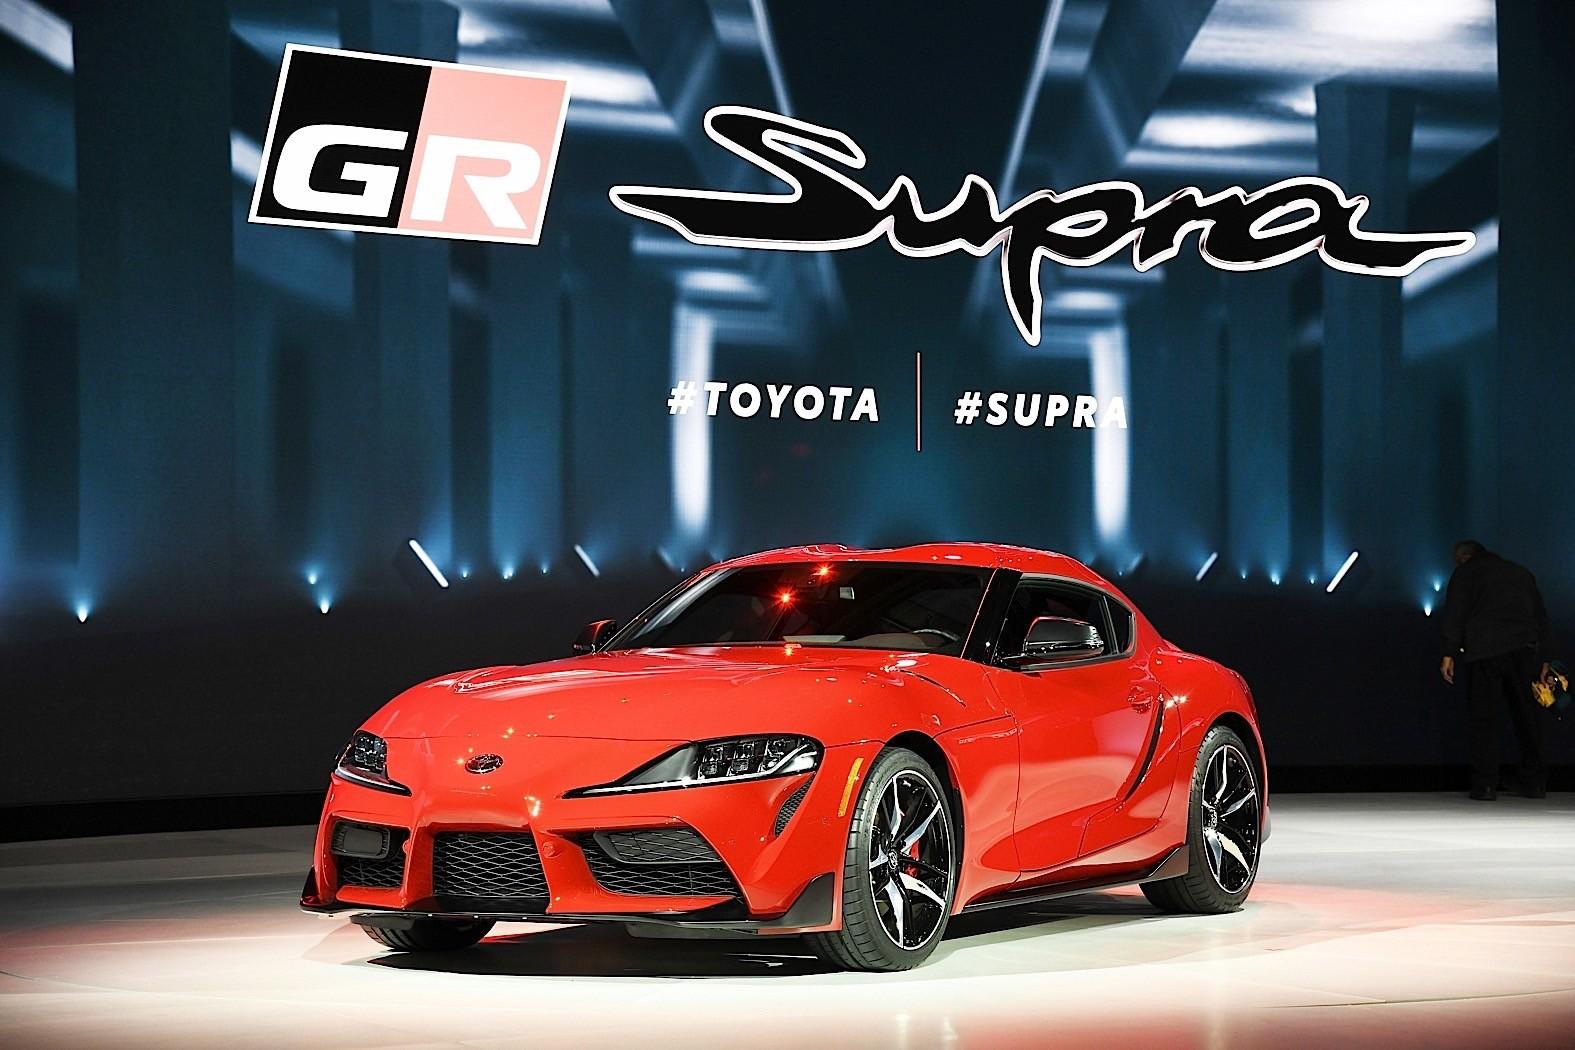 Detroit Auto Auction >> 2020 Toyota Supra Prototype to Sell at Barrett-Jackson Auction in January - autoevolution